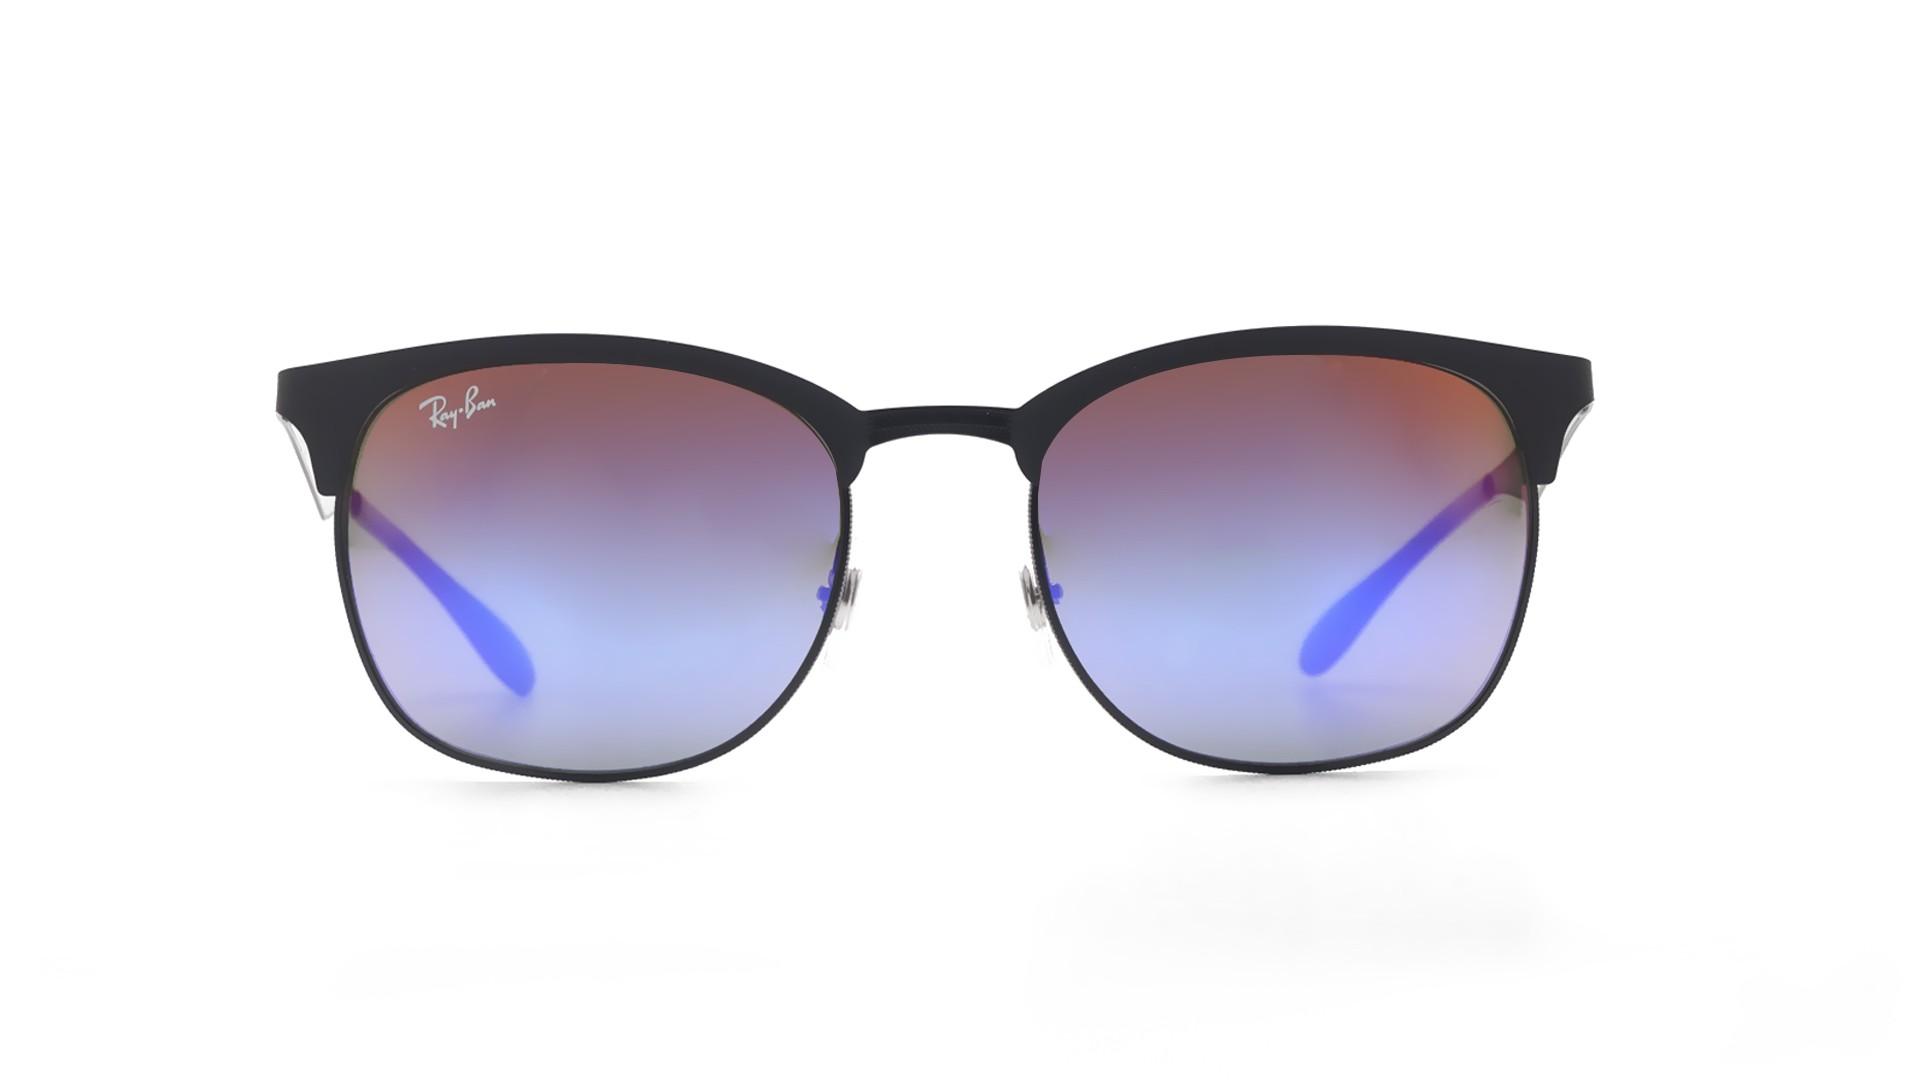 213daf1330 Sunglasses Ray-Ban RB3538 186 B1 53-19 Black Matte Medium Gradient Mirror